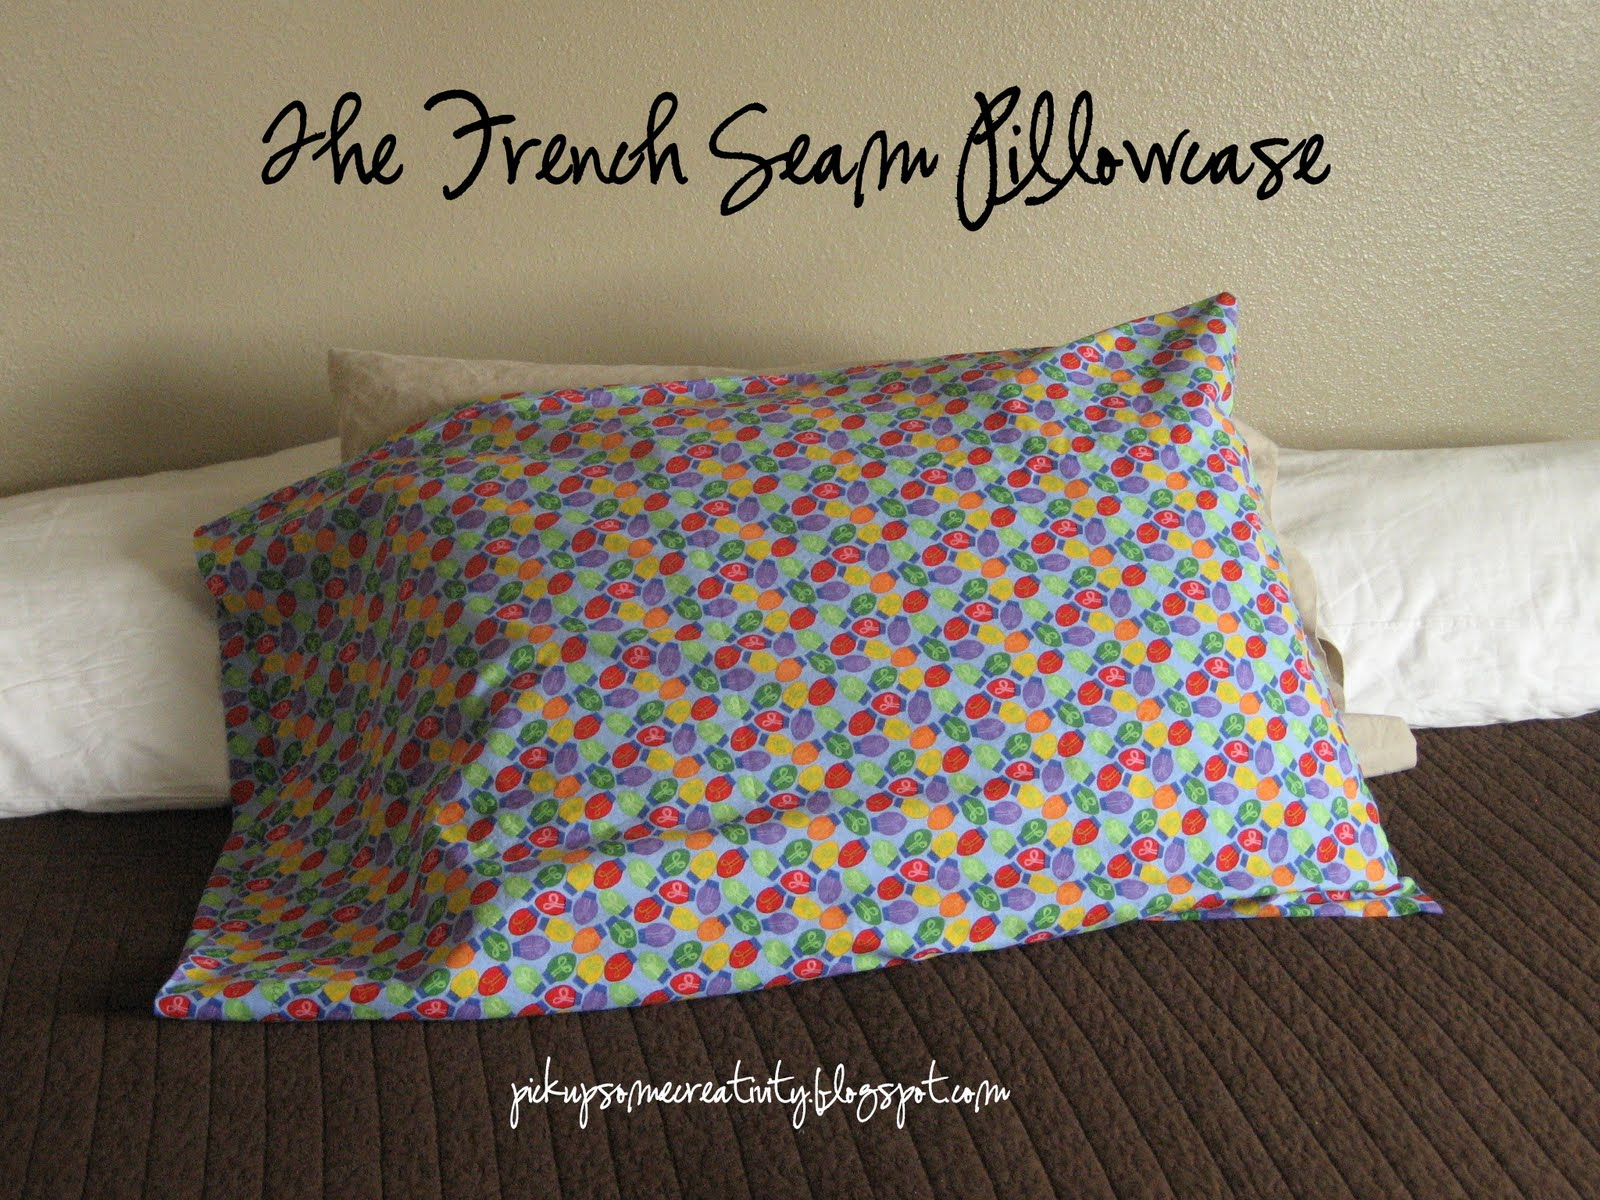 Pillowcase Tutorial Pattern: Pickup Some Creativity  French Seam Pillow Case Tutorial,